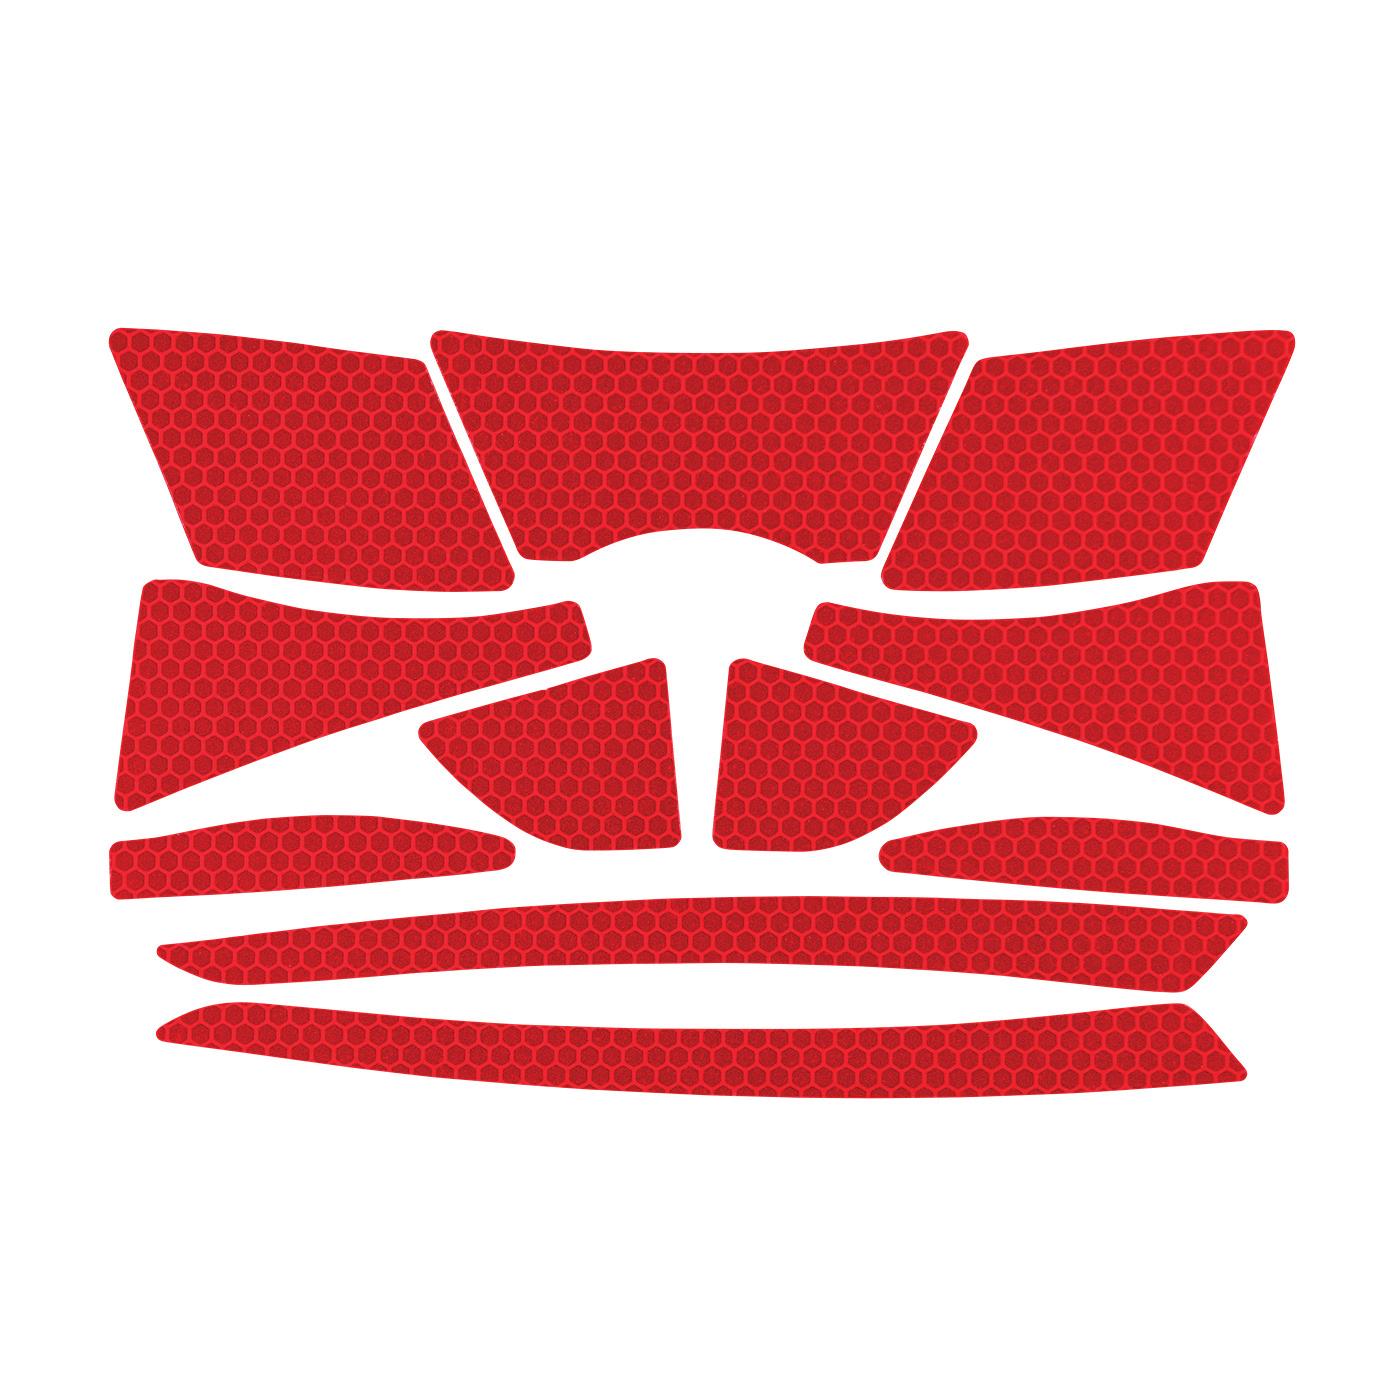 JSP® 281-CR2-10-RE Reflective Kit, Red